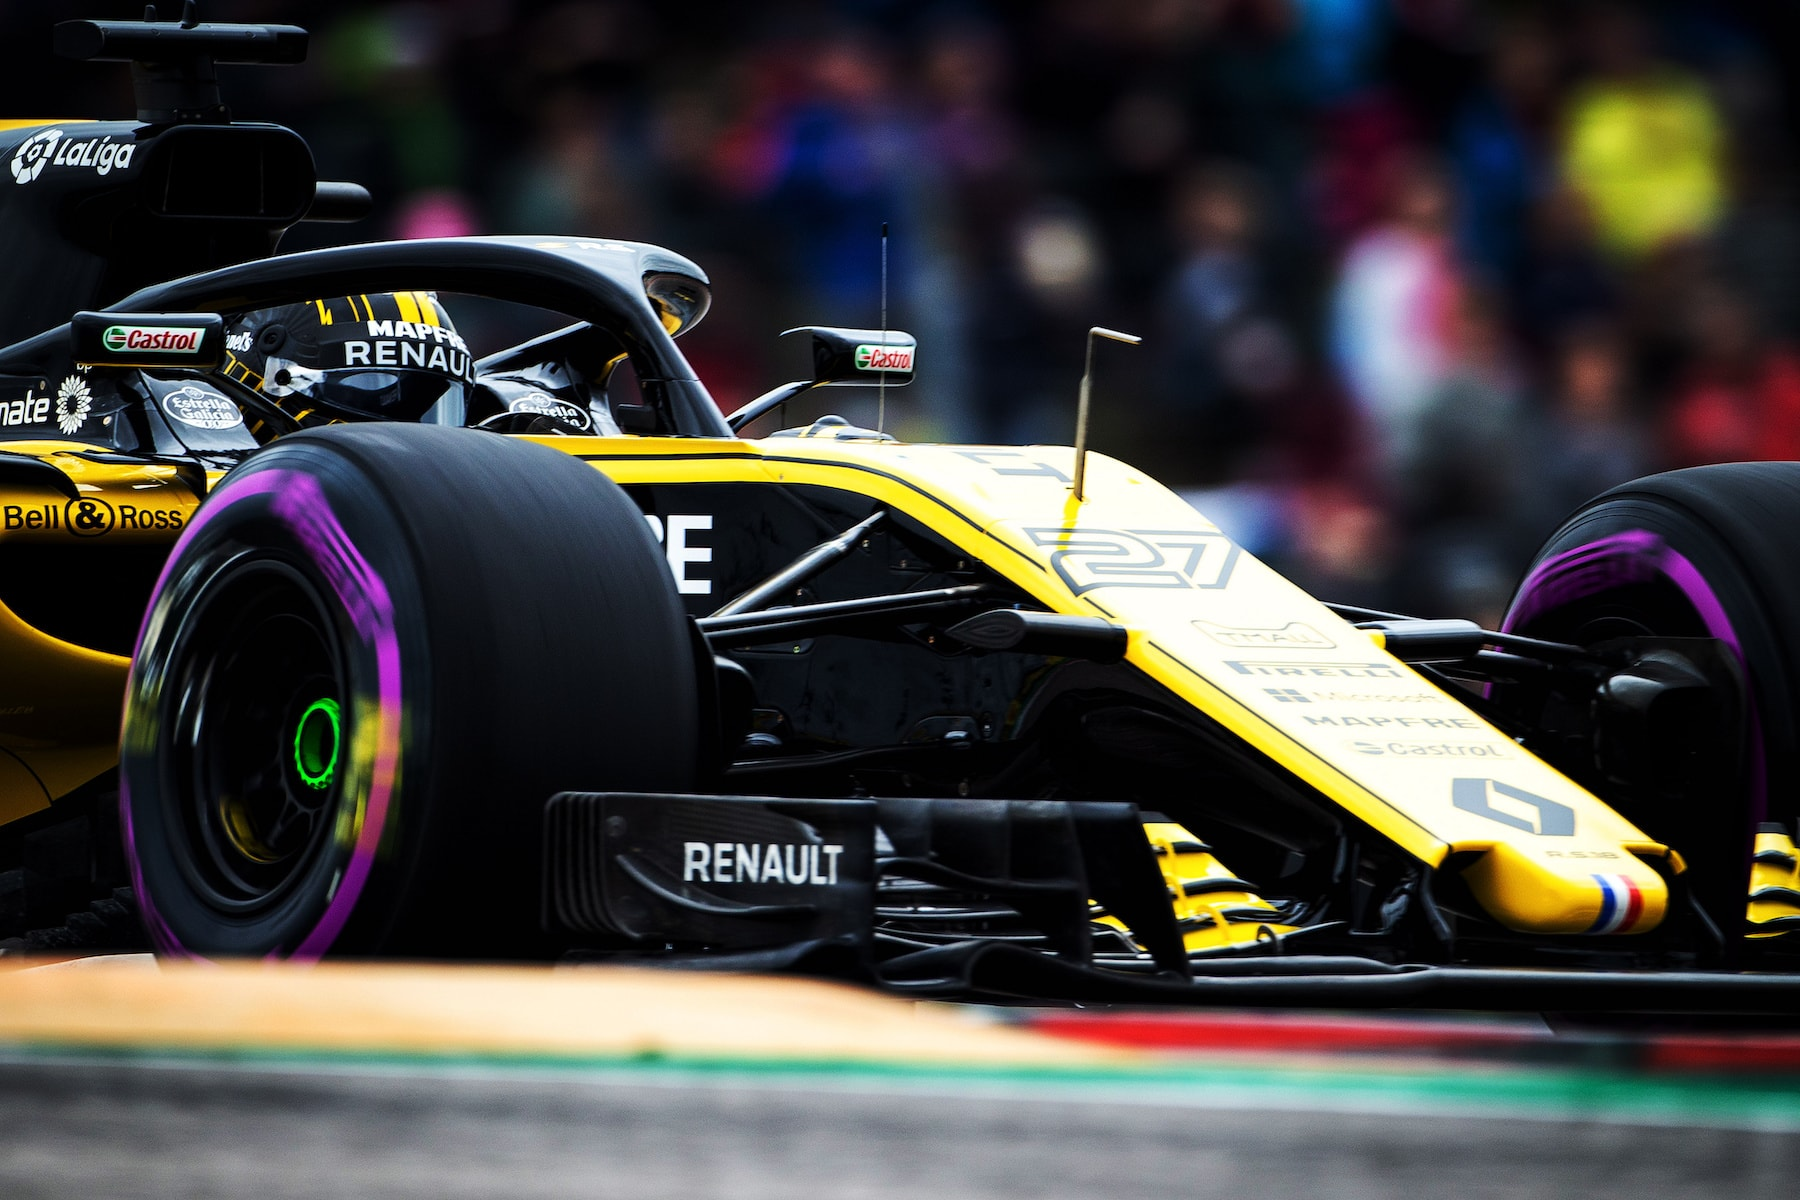 G 2018 Nico Hulkenberg | Renault RS18 | 2018 USGP Q3 1 copy.jpg